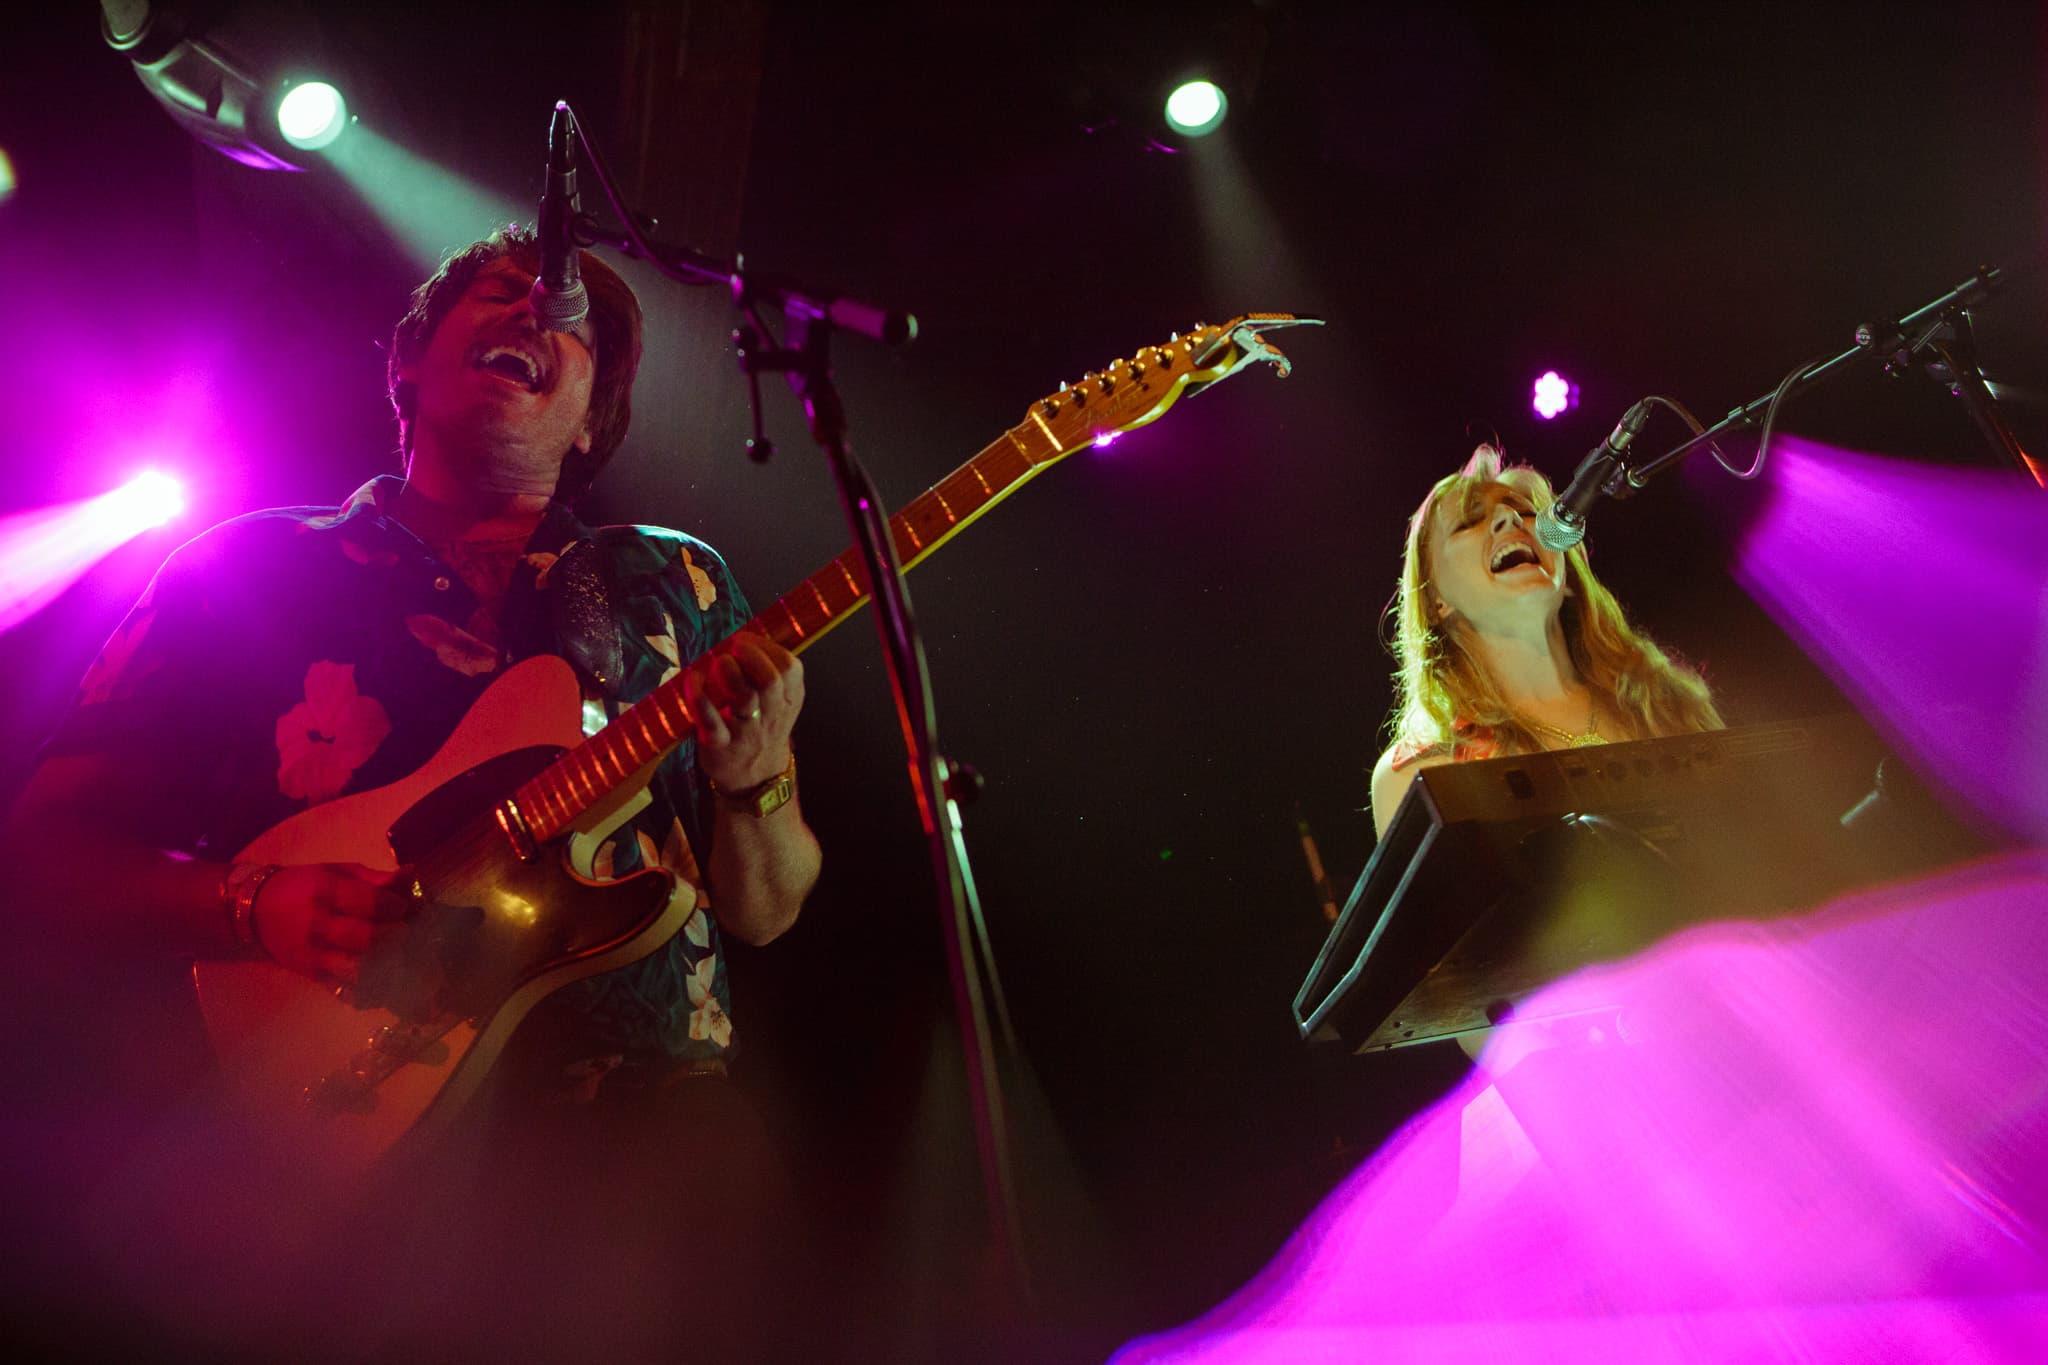 Photo by Jake Hanson